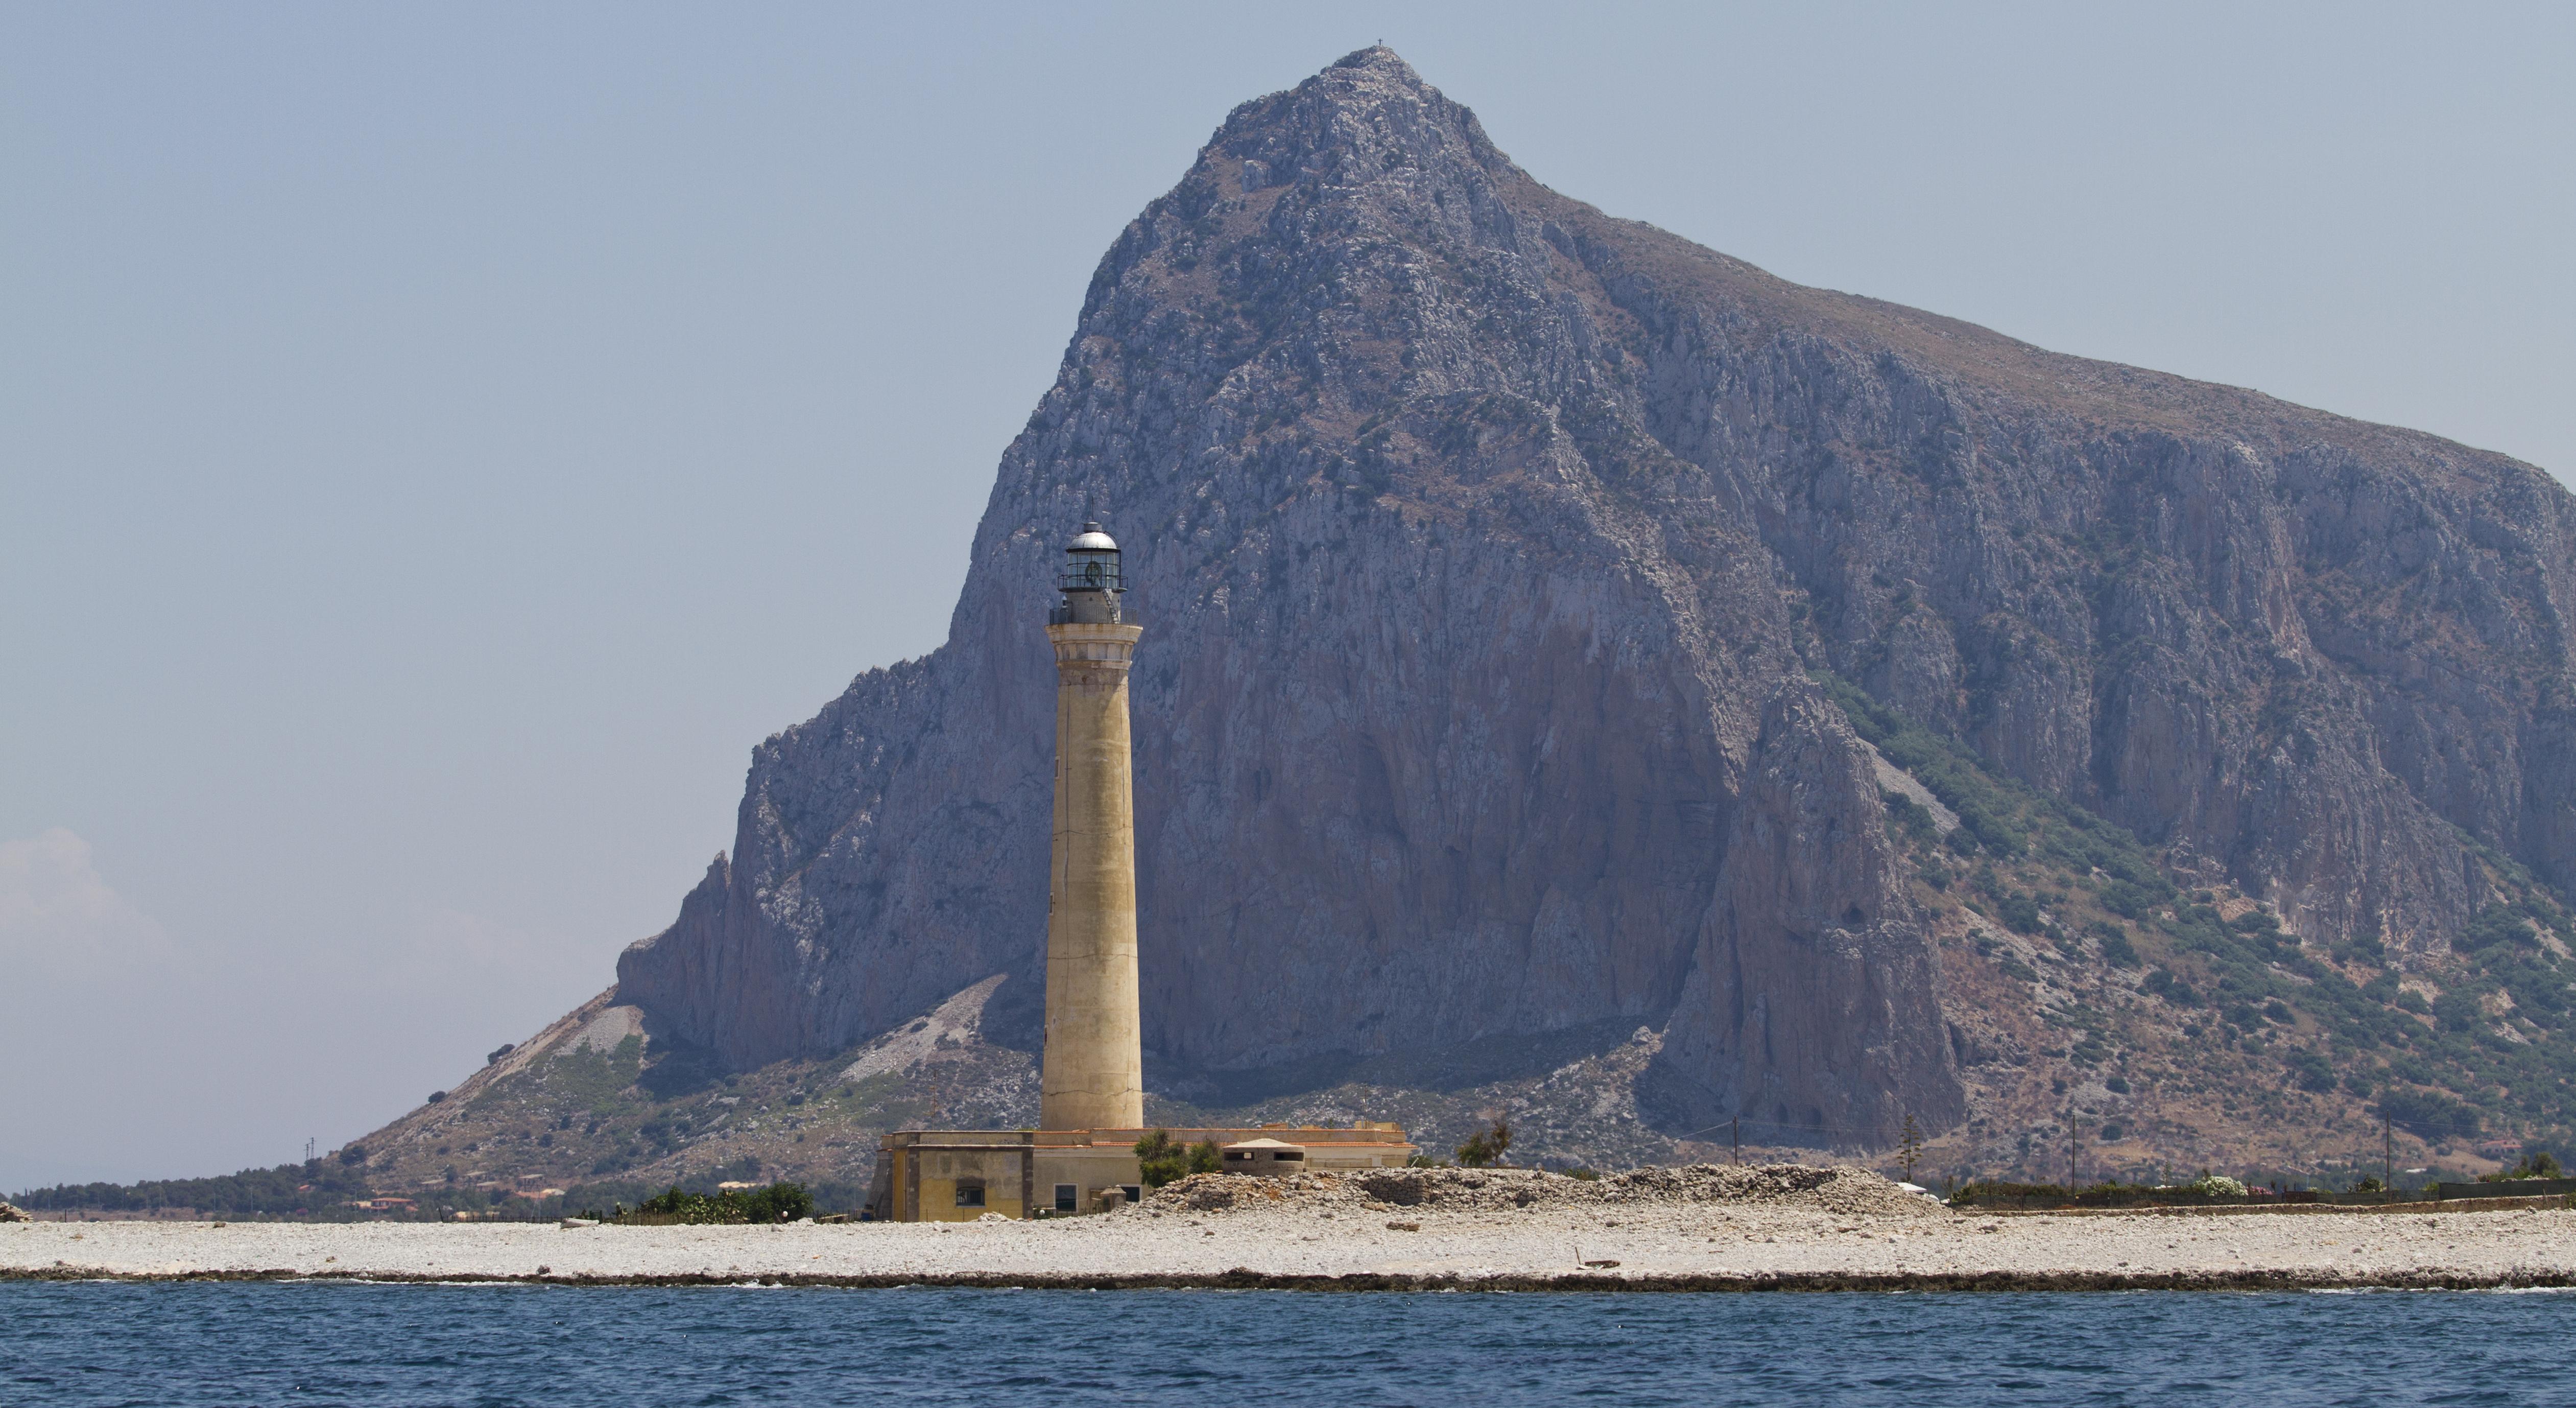 San Vito Lo Capo Faro, San Vito lo capo TP, Sicily, Italy - panoramio.jpg